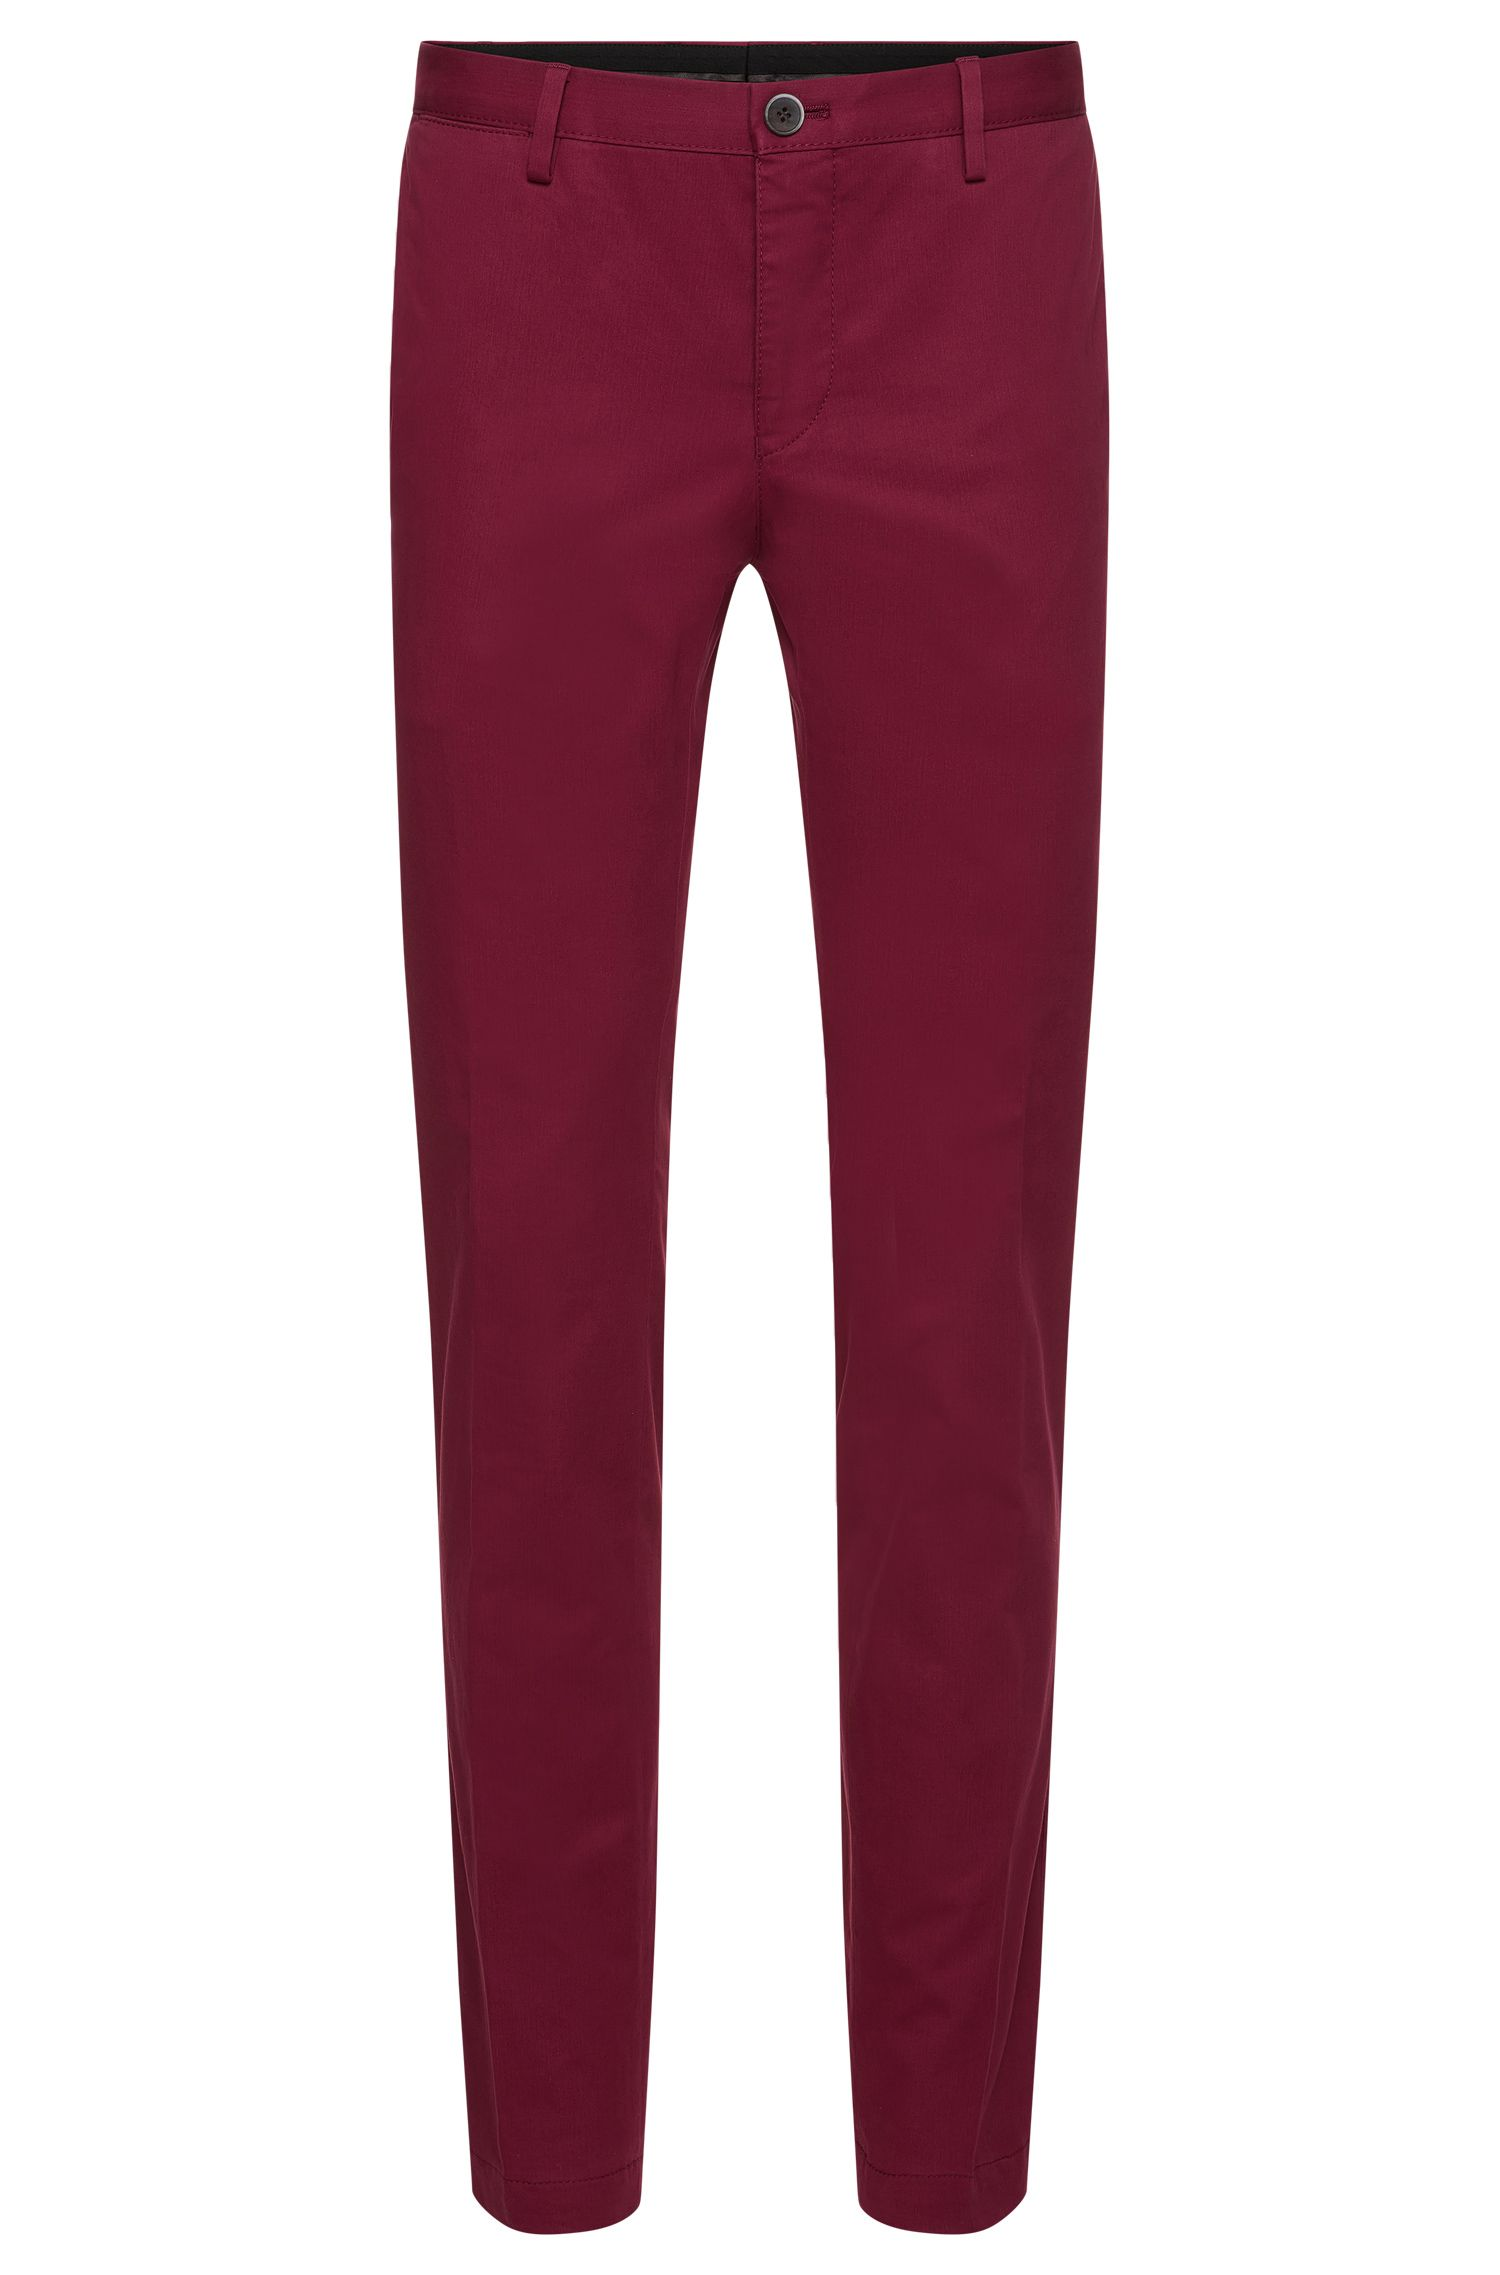 Stretch Cotton Chino Pant, Slim Fit | Stanino W, Dark Purple